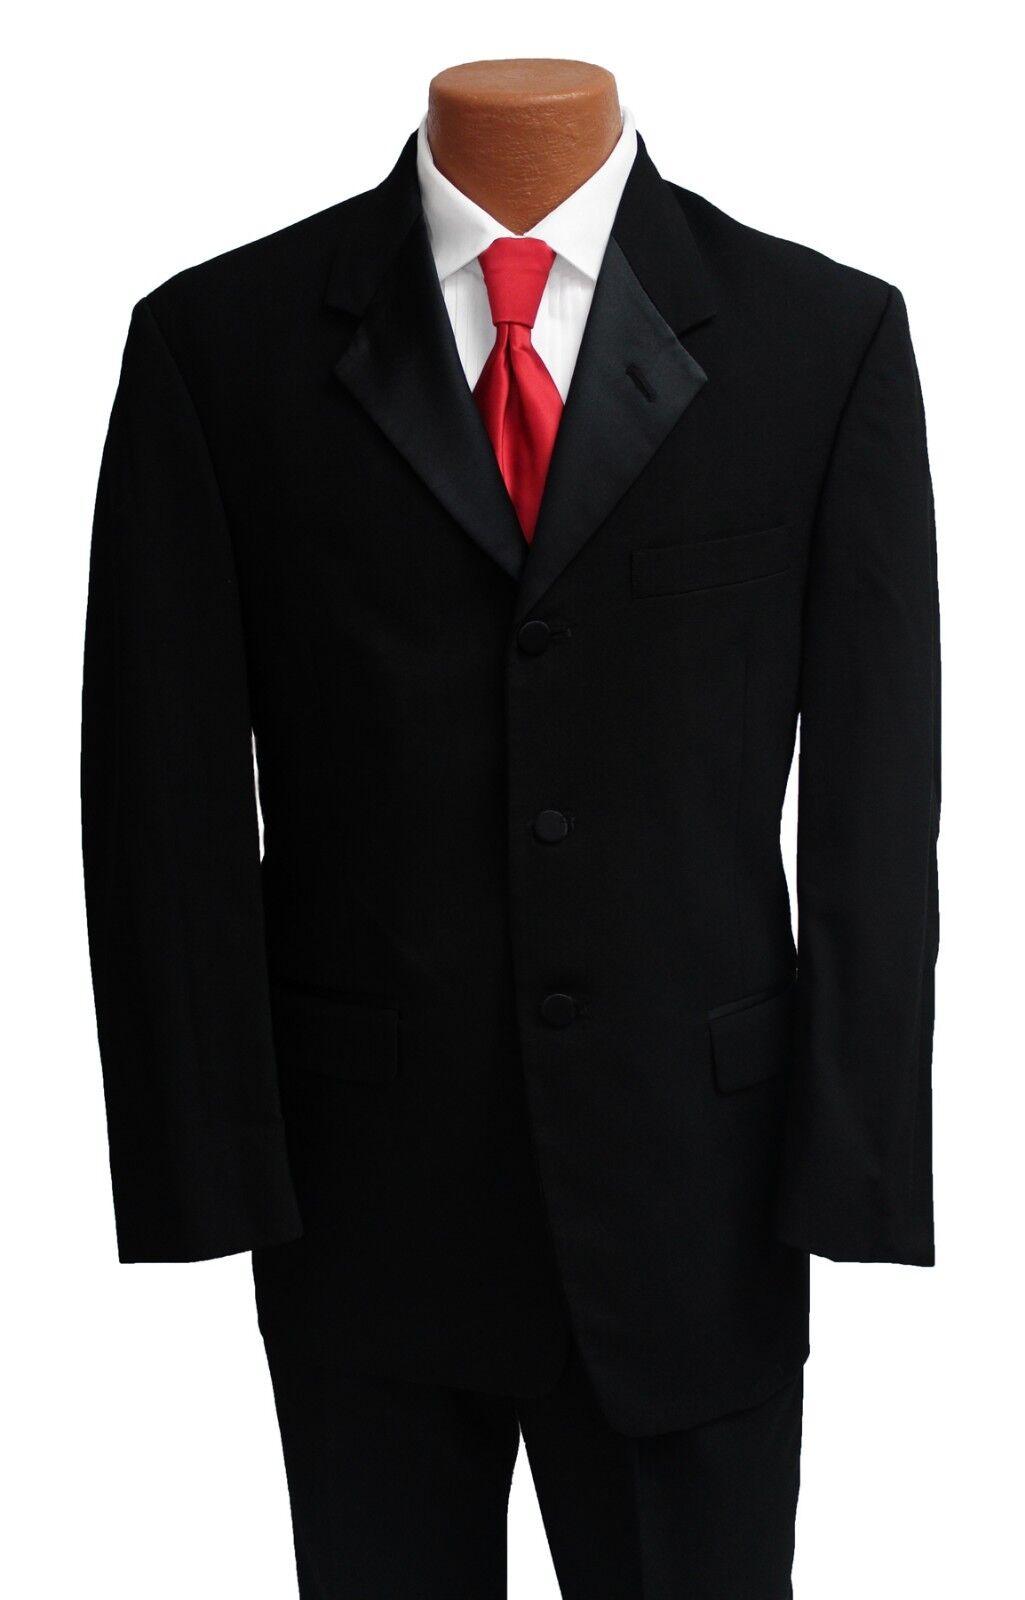 41L Black Halloween Costume Tuxedo Jacket Butler Zombie James Bond 007 Trump